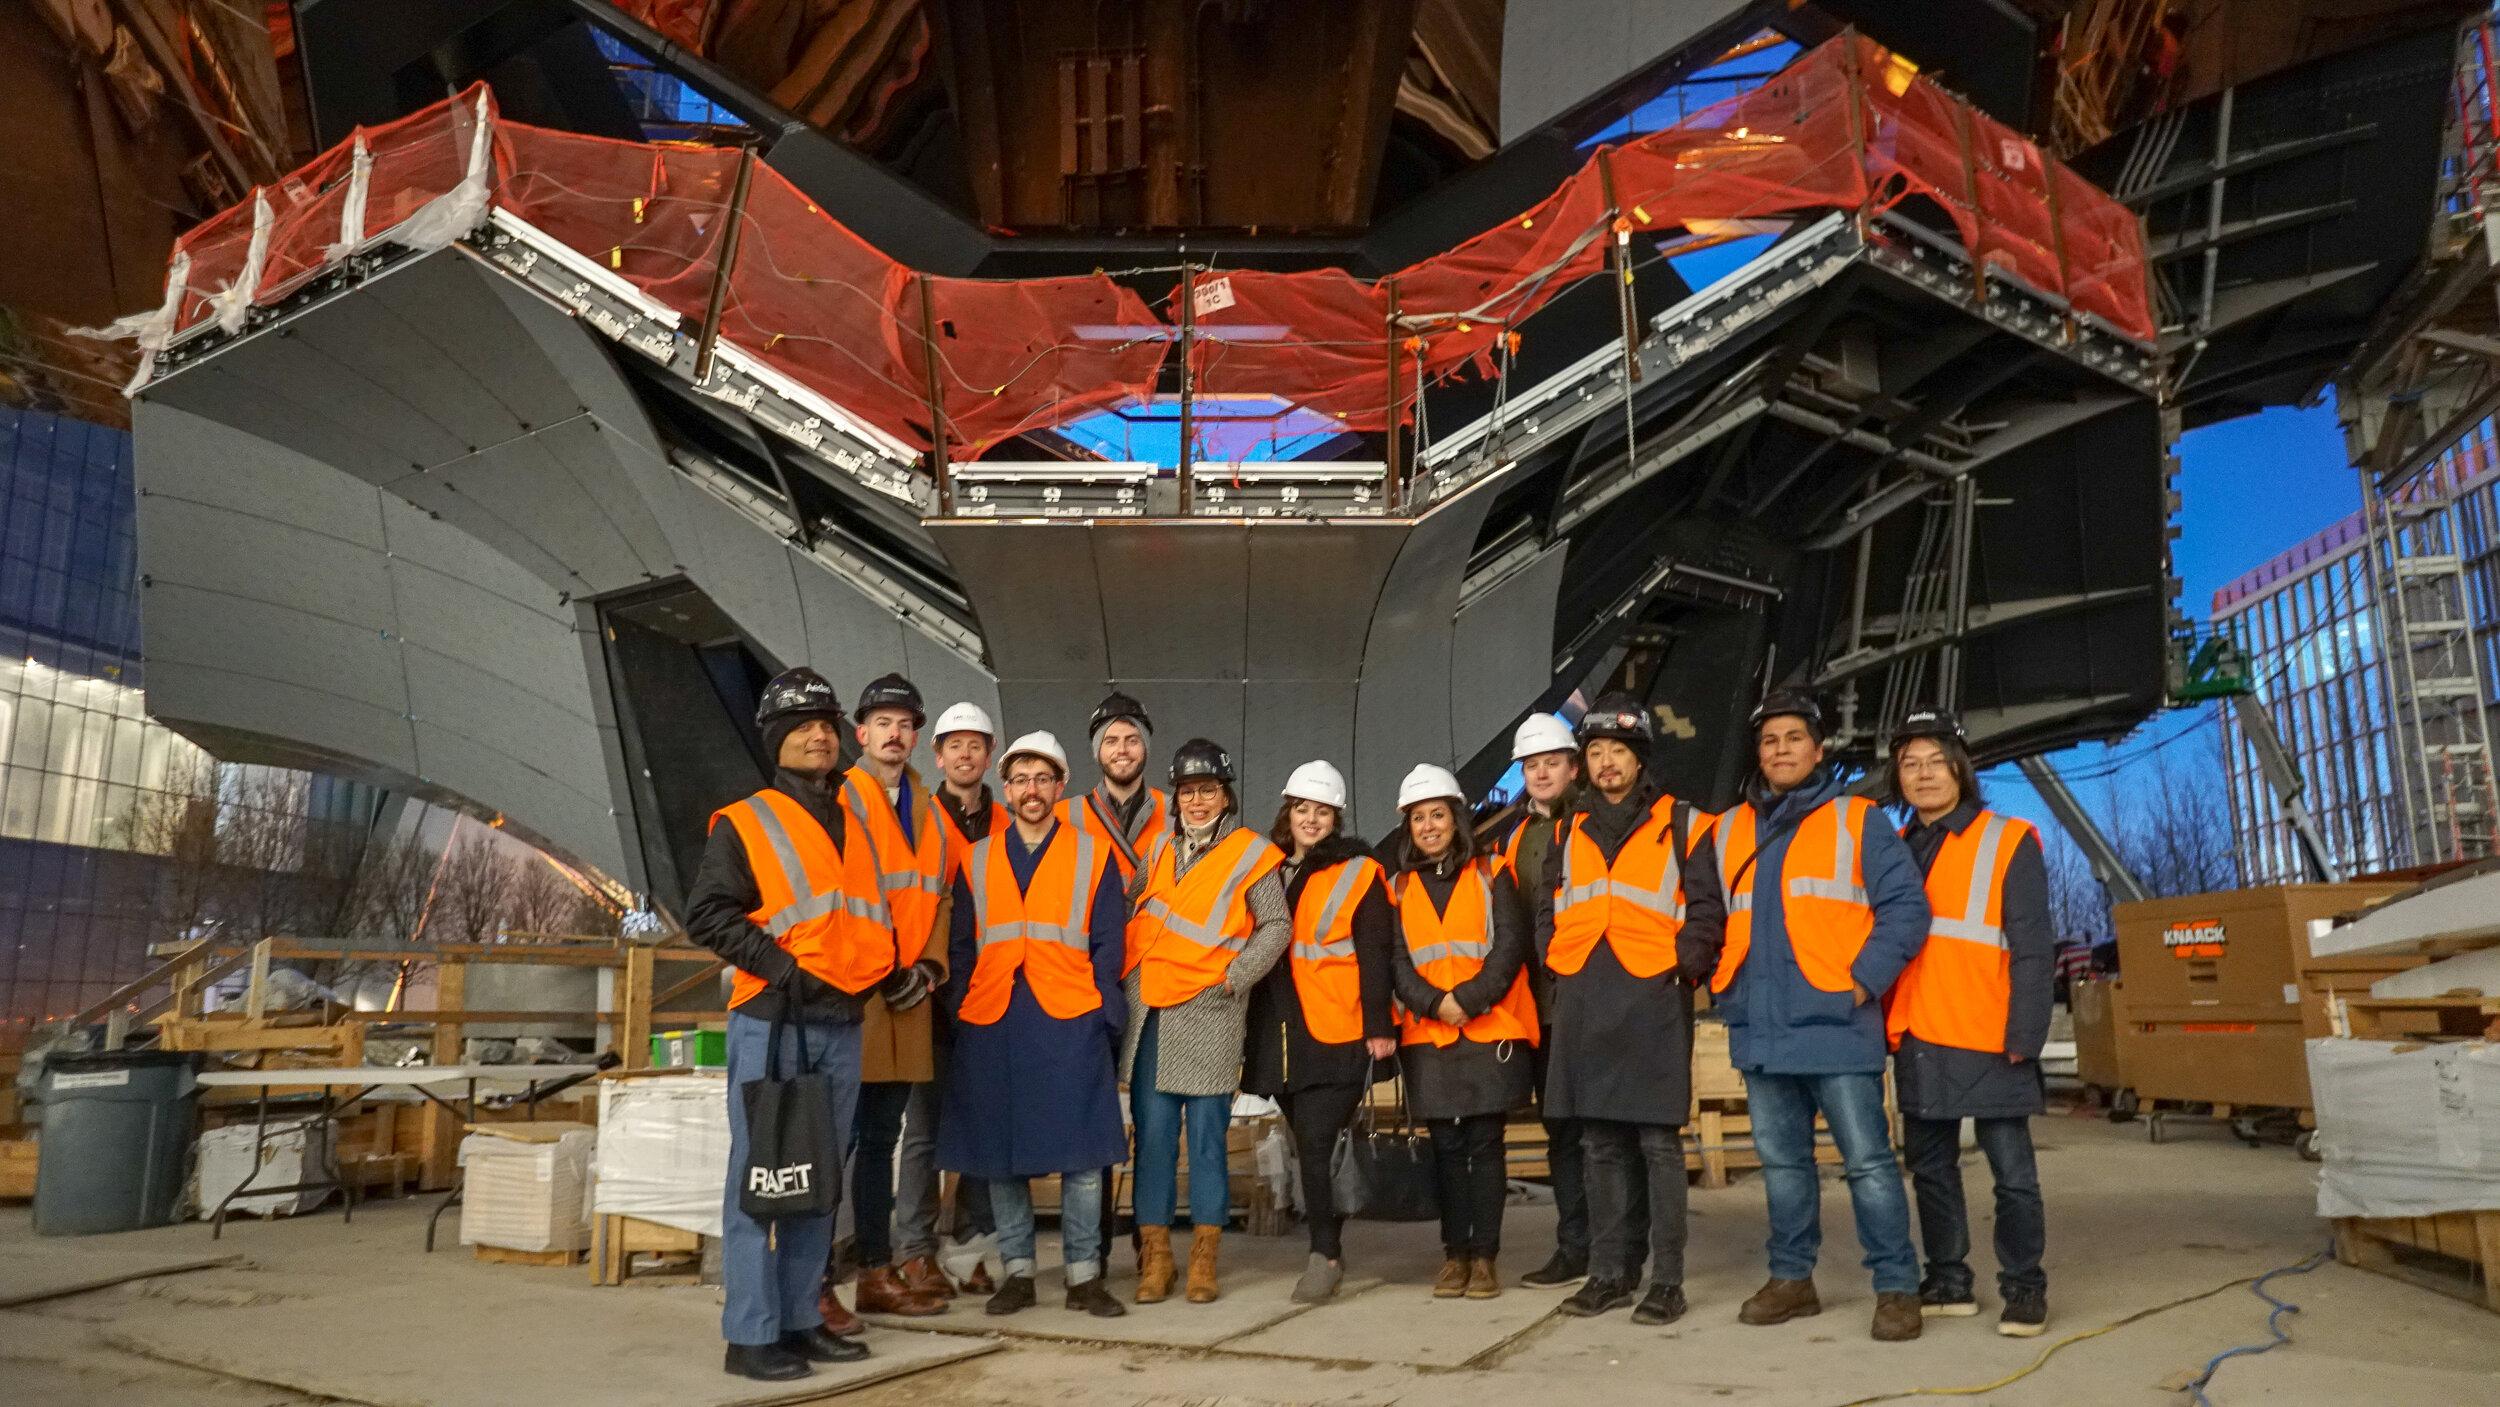 (Cold) visitors at the foot of Vessel, from left: Satyendra, André, Newt, Taylor, Shane, Daisy, Julia, Olga, Max, Simon, Brian, Sang